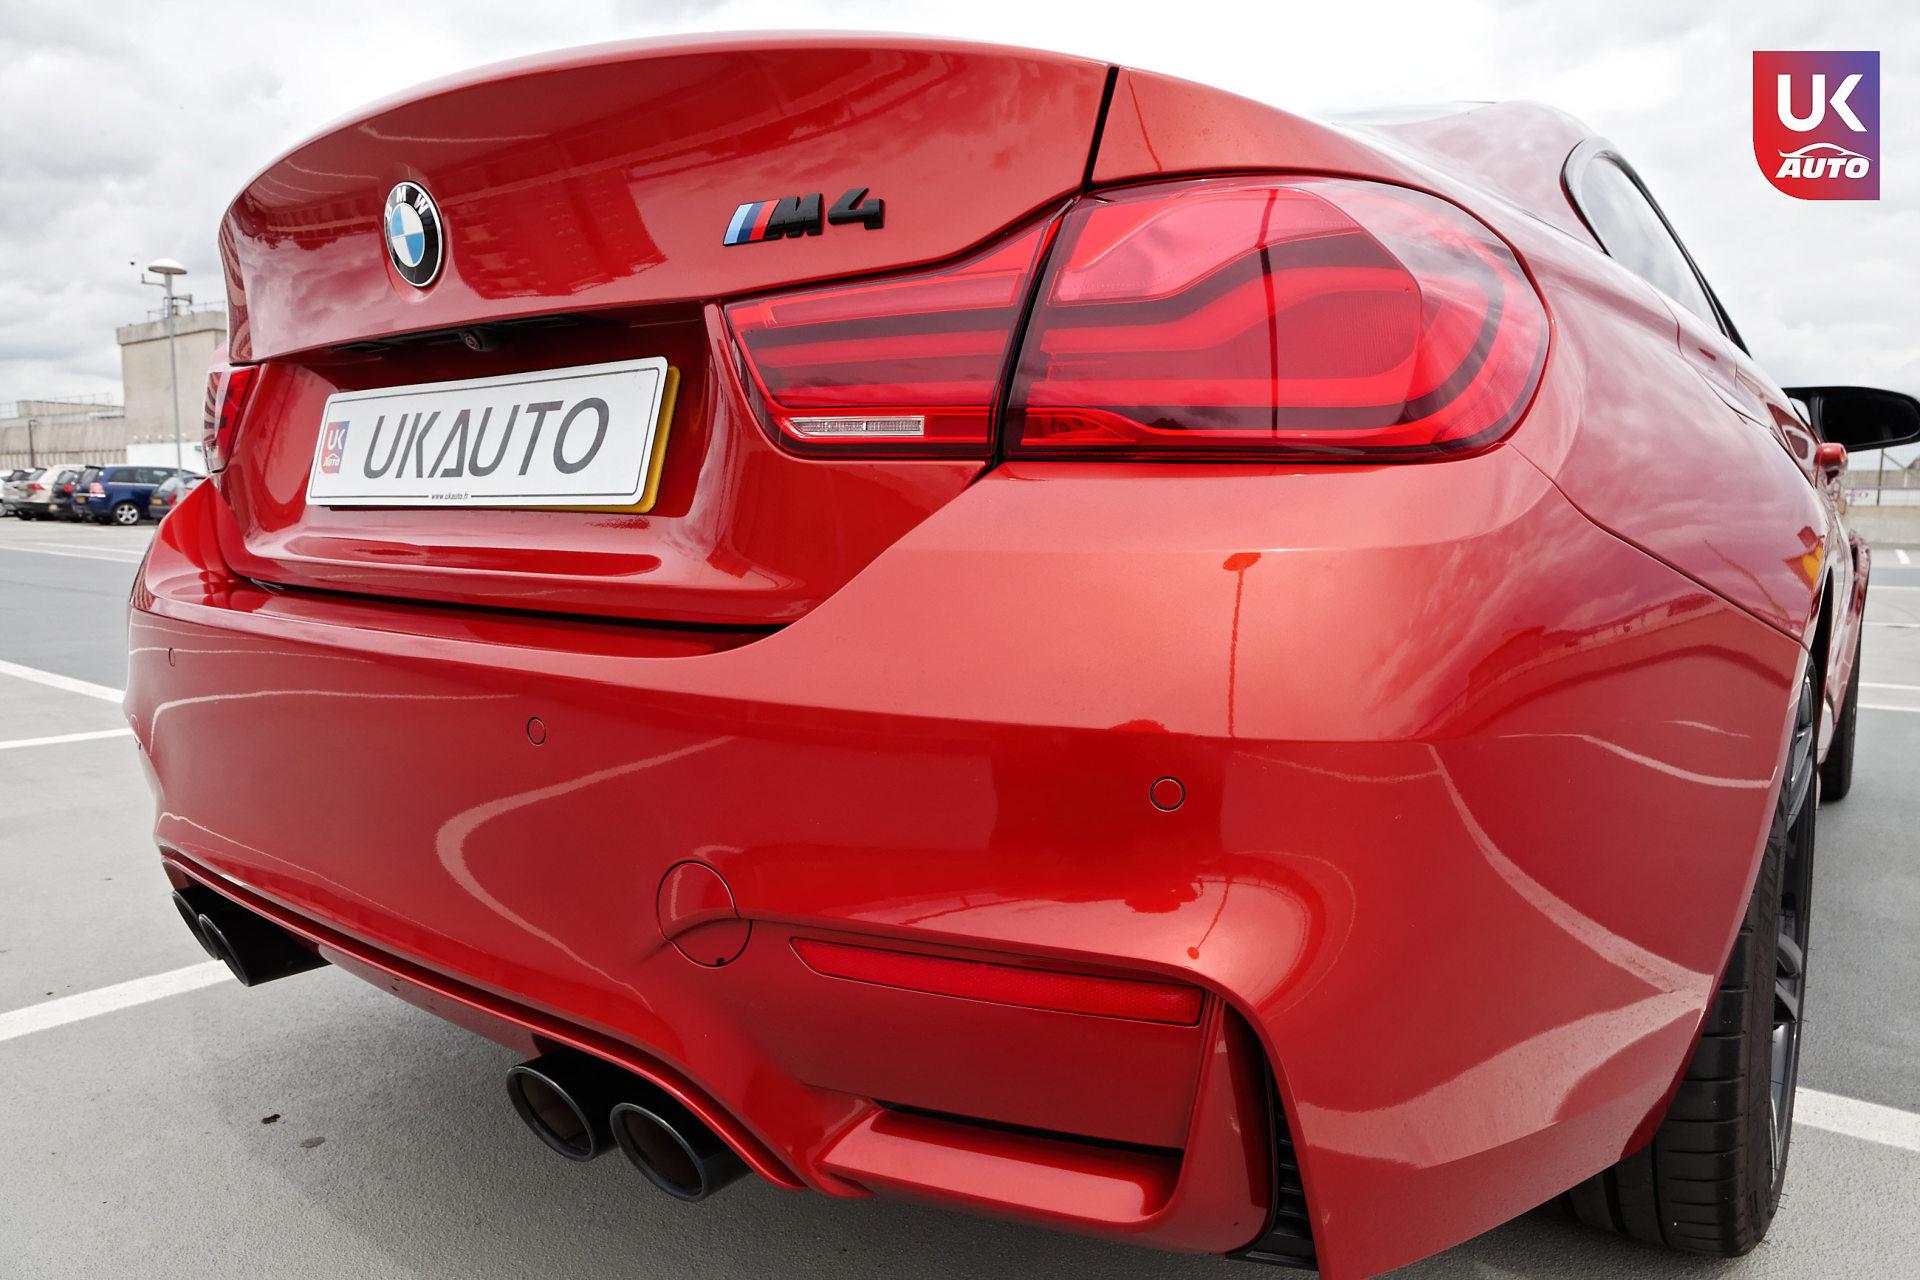 BMW M4 PACK COMPETITION BMW ANGLETERRE BMW IMPORT UK BMW MANDATAIRE AUTO6 DxO - IMPORTATION BMW M4 BMW IMPORT ROYAUME UNI BMW M4 COMPETITION RHD CLIENT UKAUTO